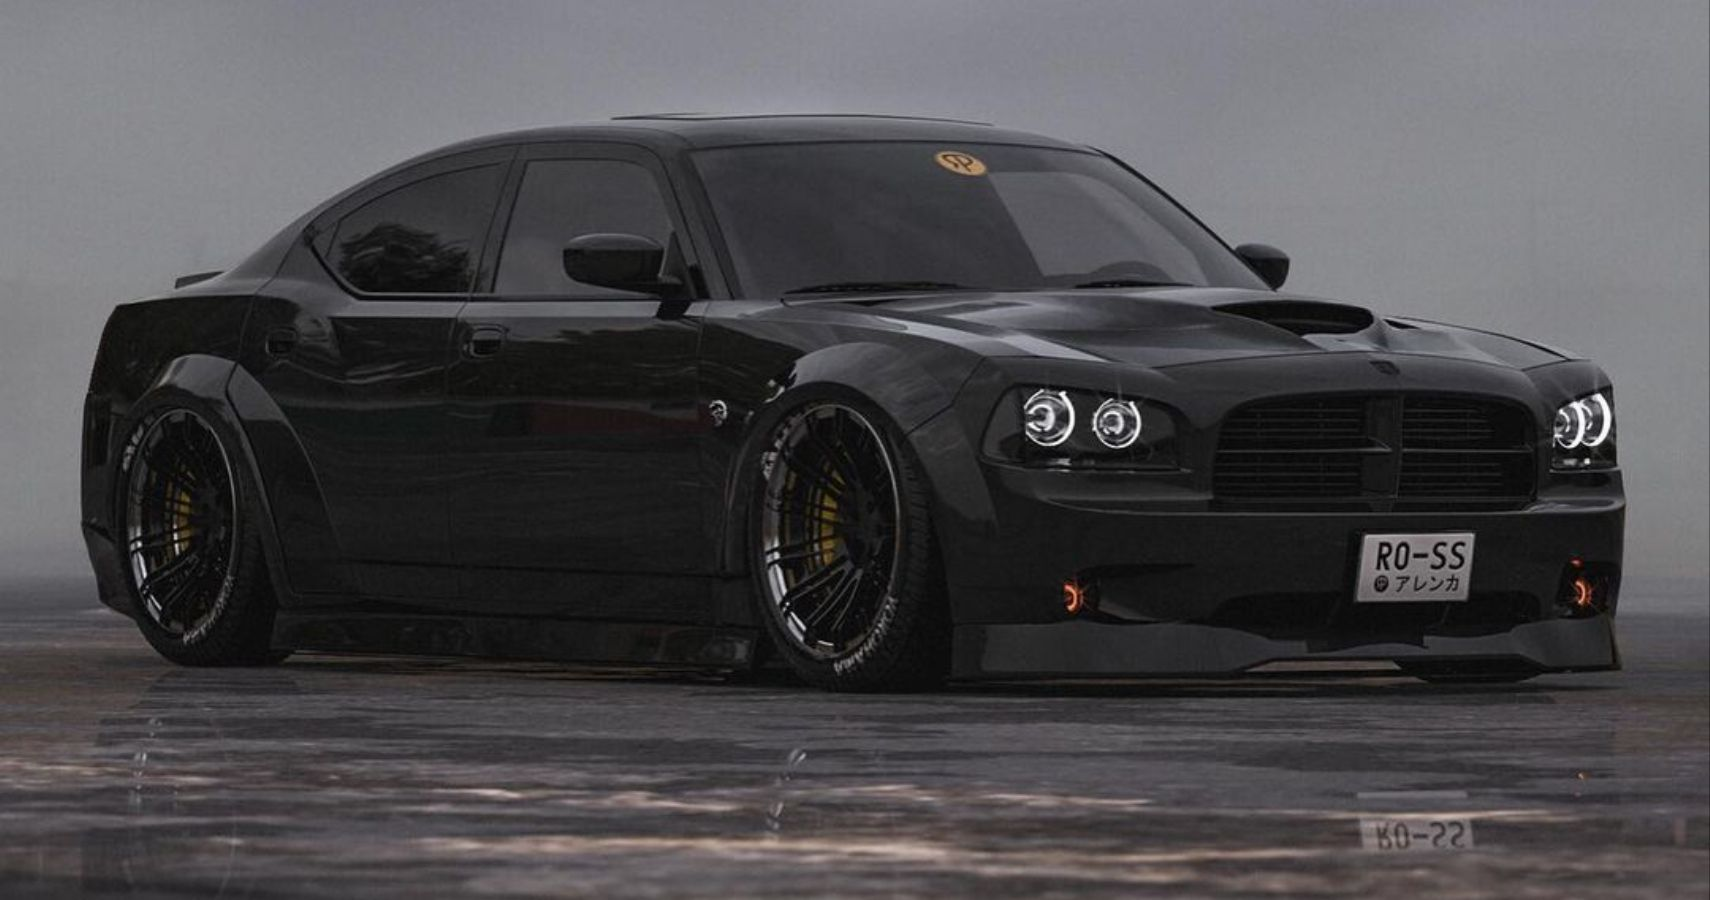 www.hotcars.com